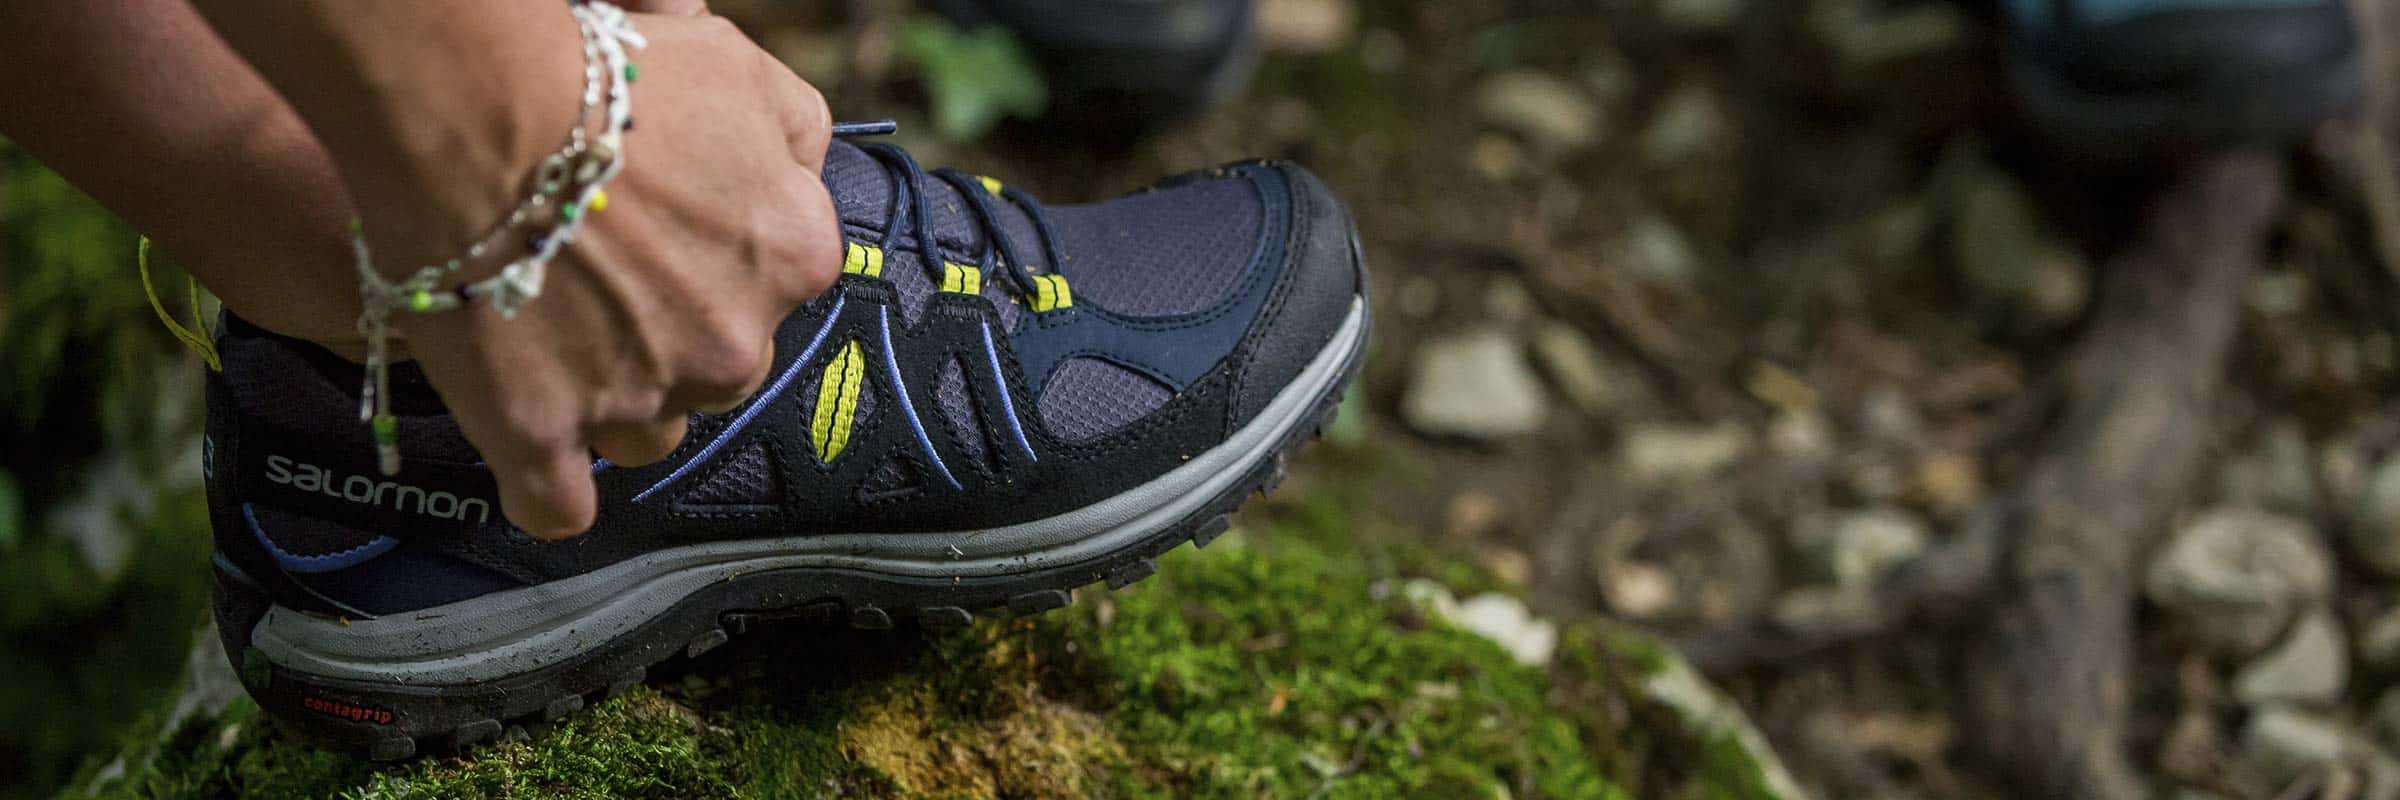 Randonnee pedestre bottes vs souliers | Salomon, Lowa